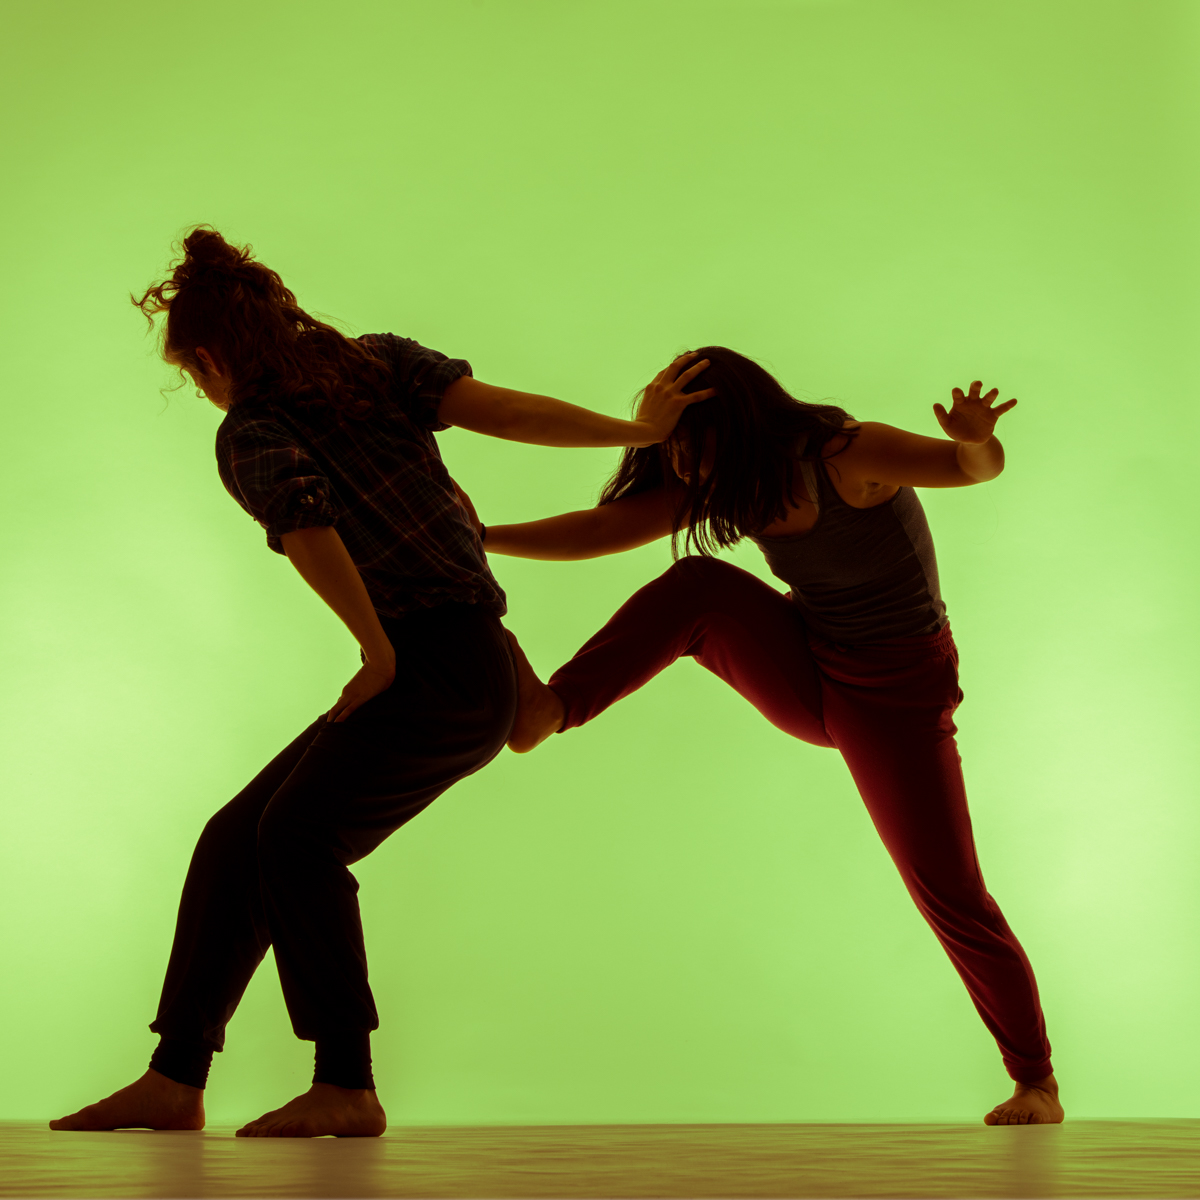 stephen-rusk-alexandra-pholien-leanne-vincent-contemporary-dance-18-10-33.jpg